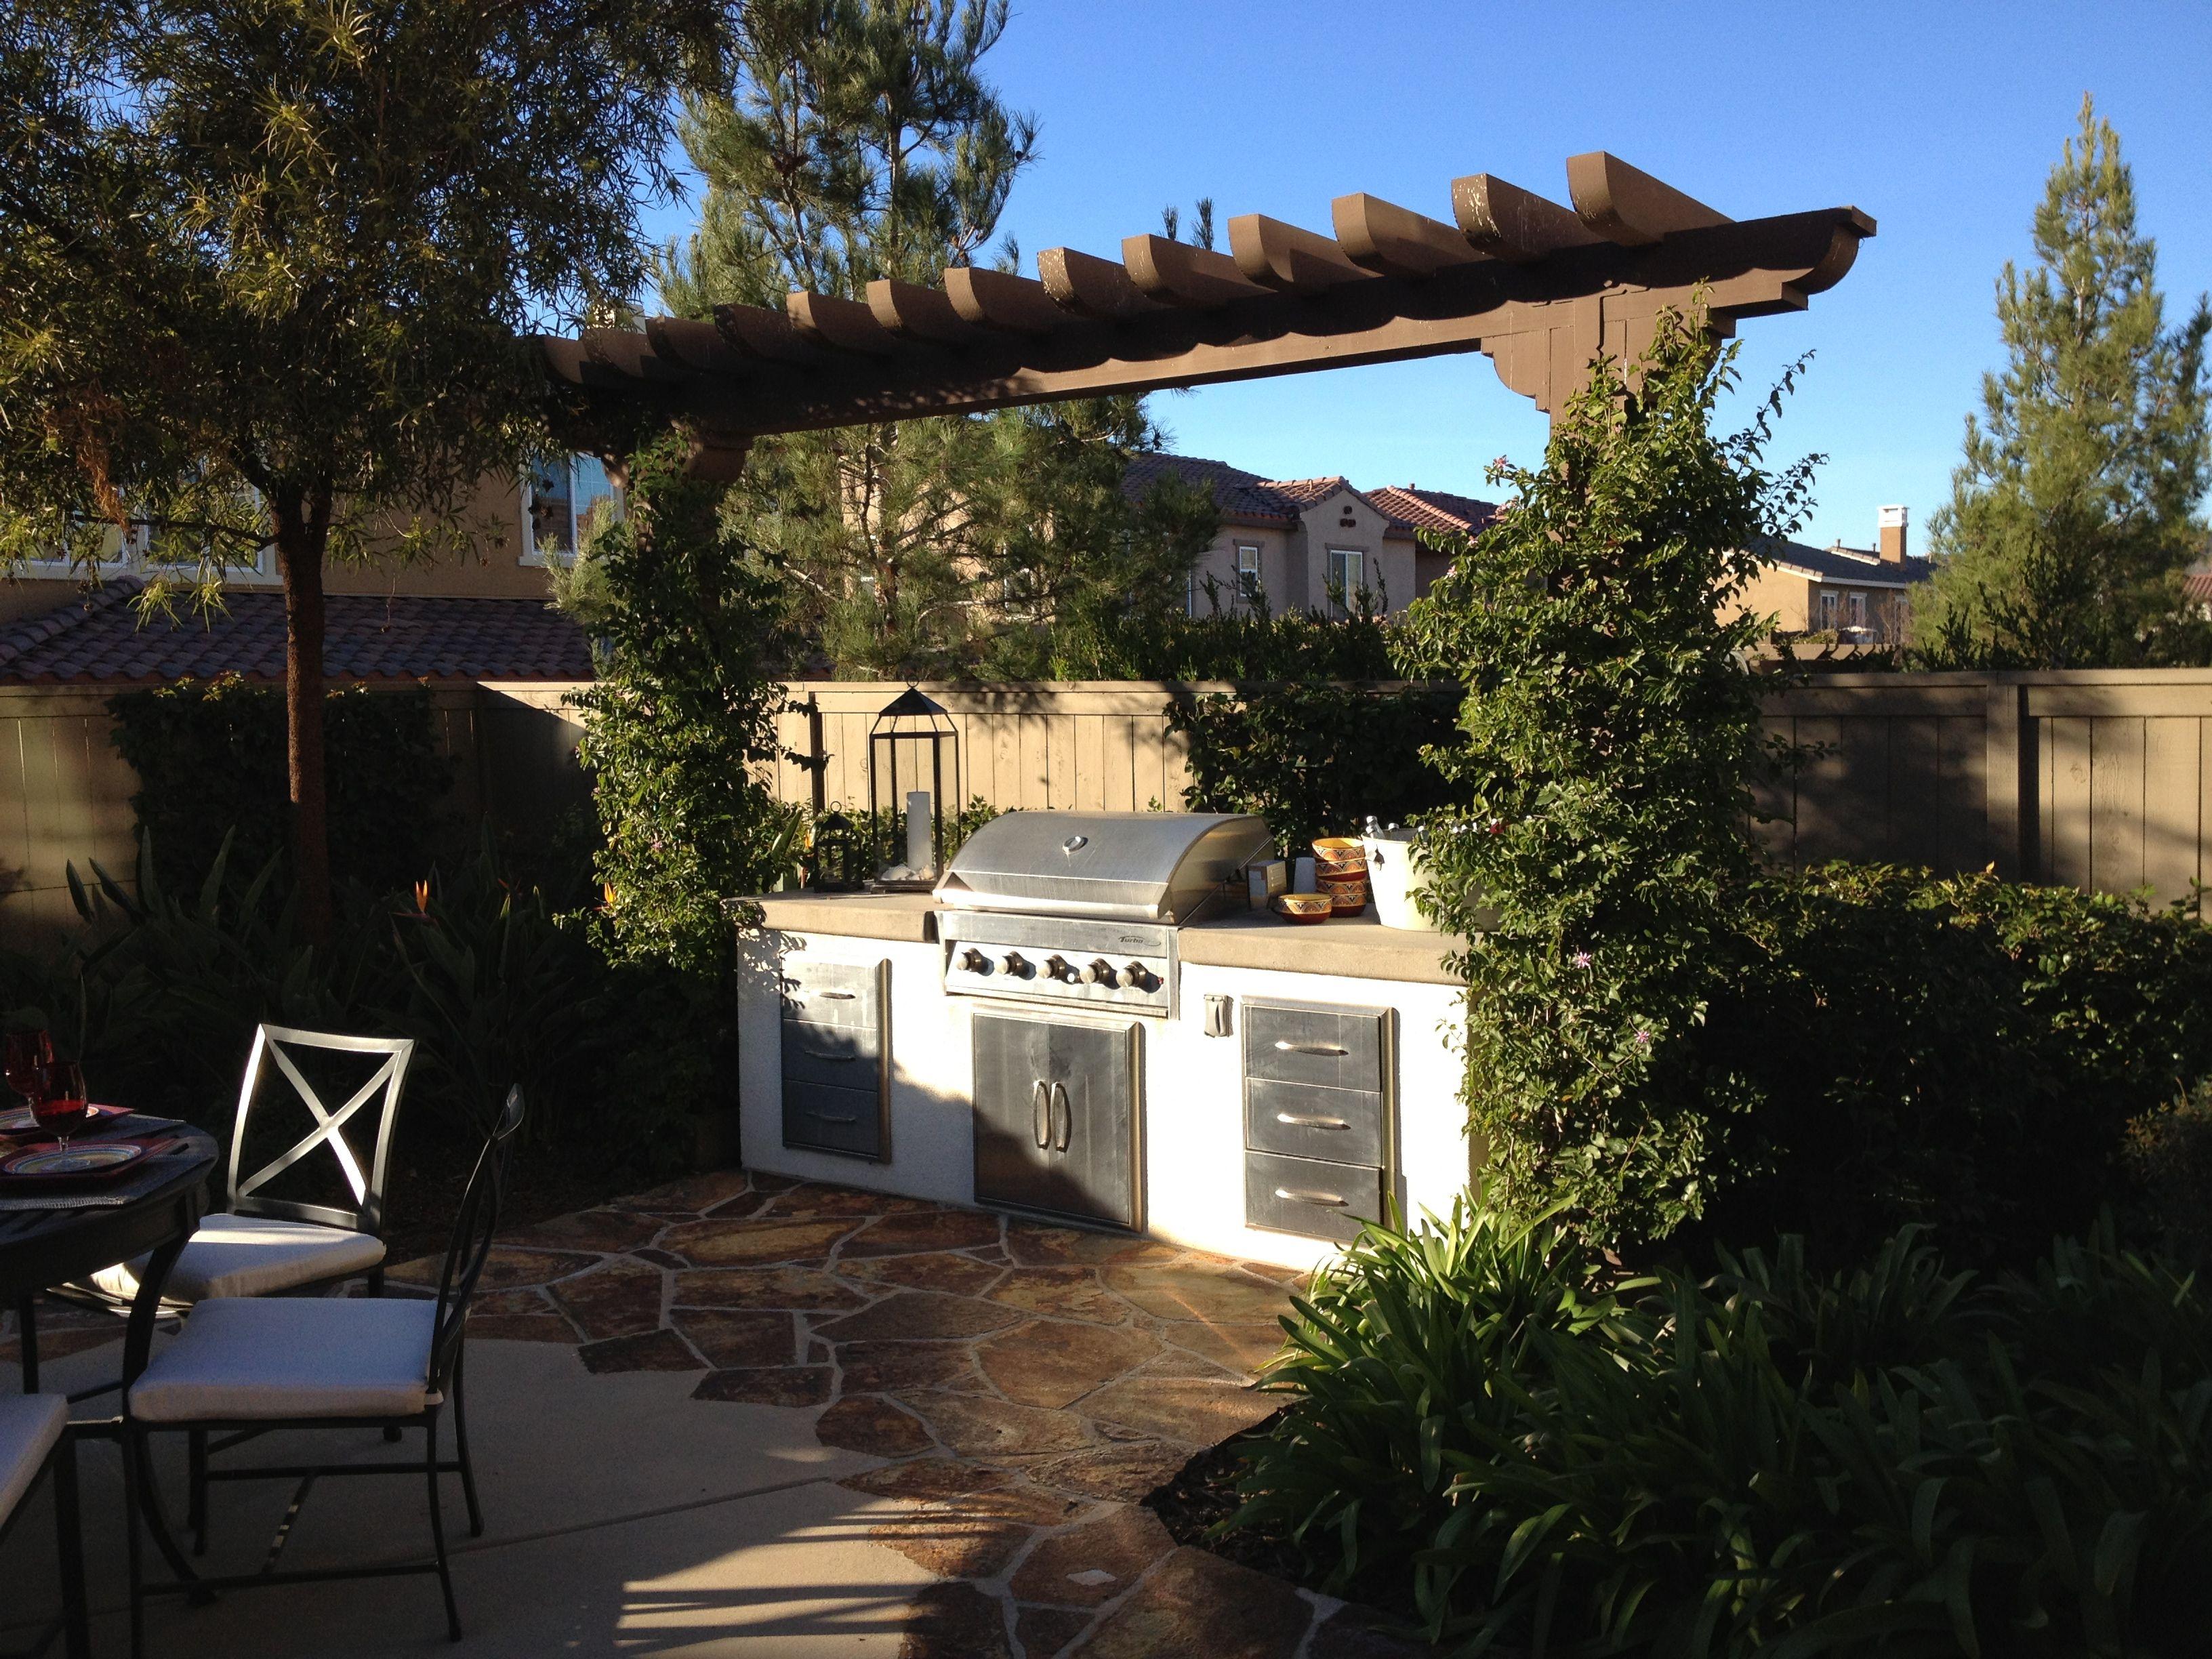 trellis to block neighbors yard ideas pinterest yard ideas garden ideas and yards. Black Bedroom Furniture Sets. Home Design Ideas